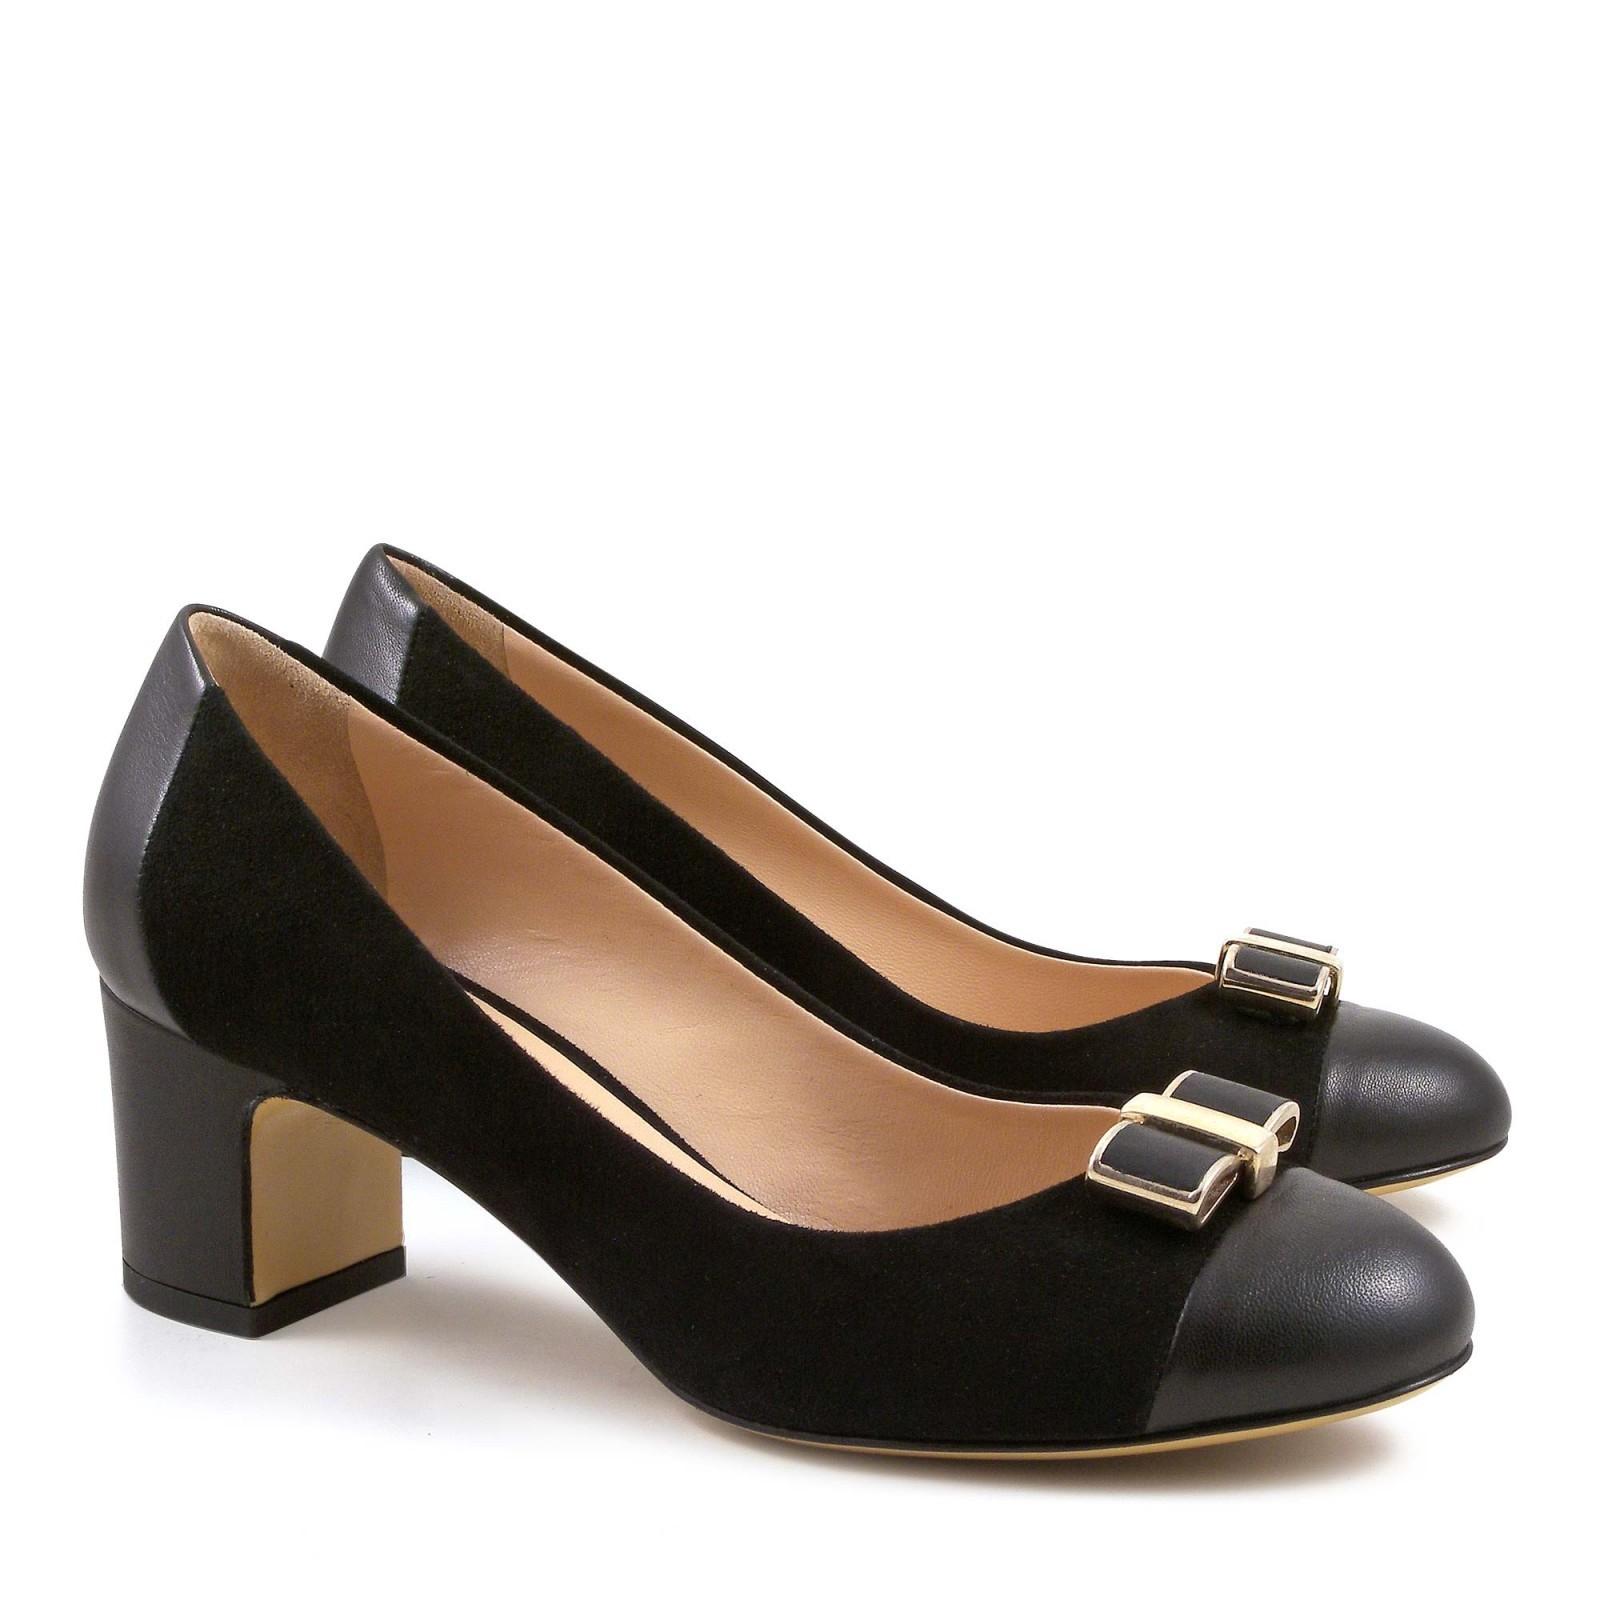 italian pumps shoes in black suede leather medium heels